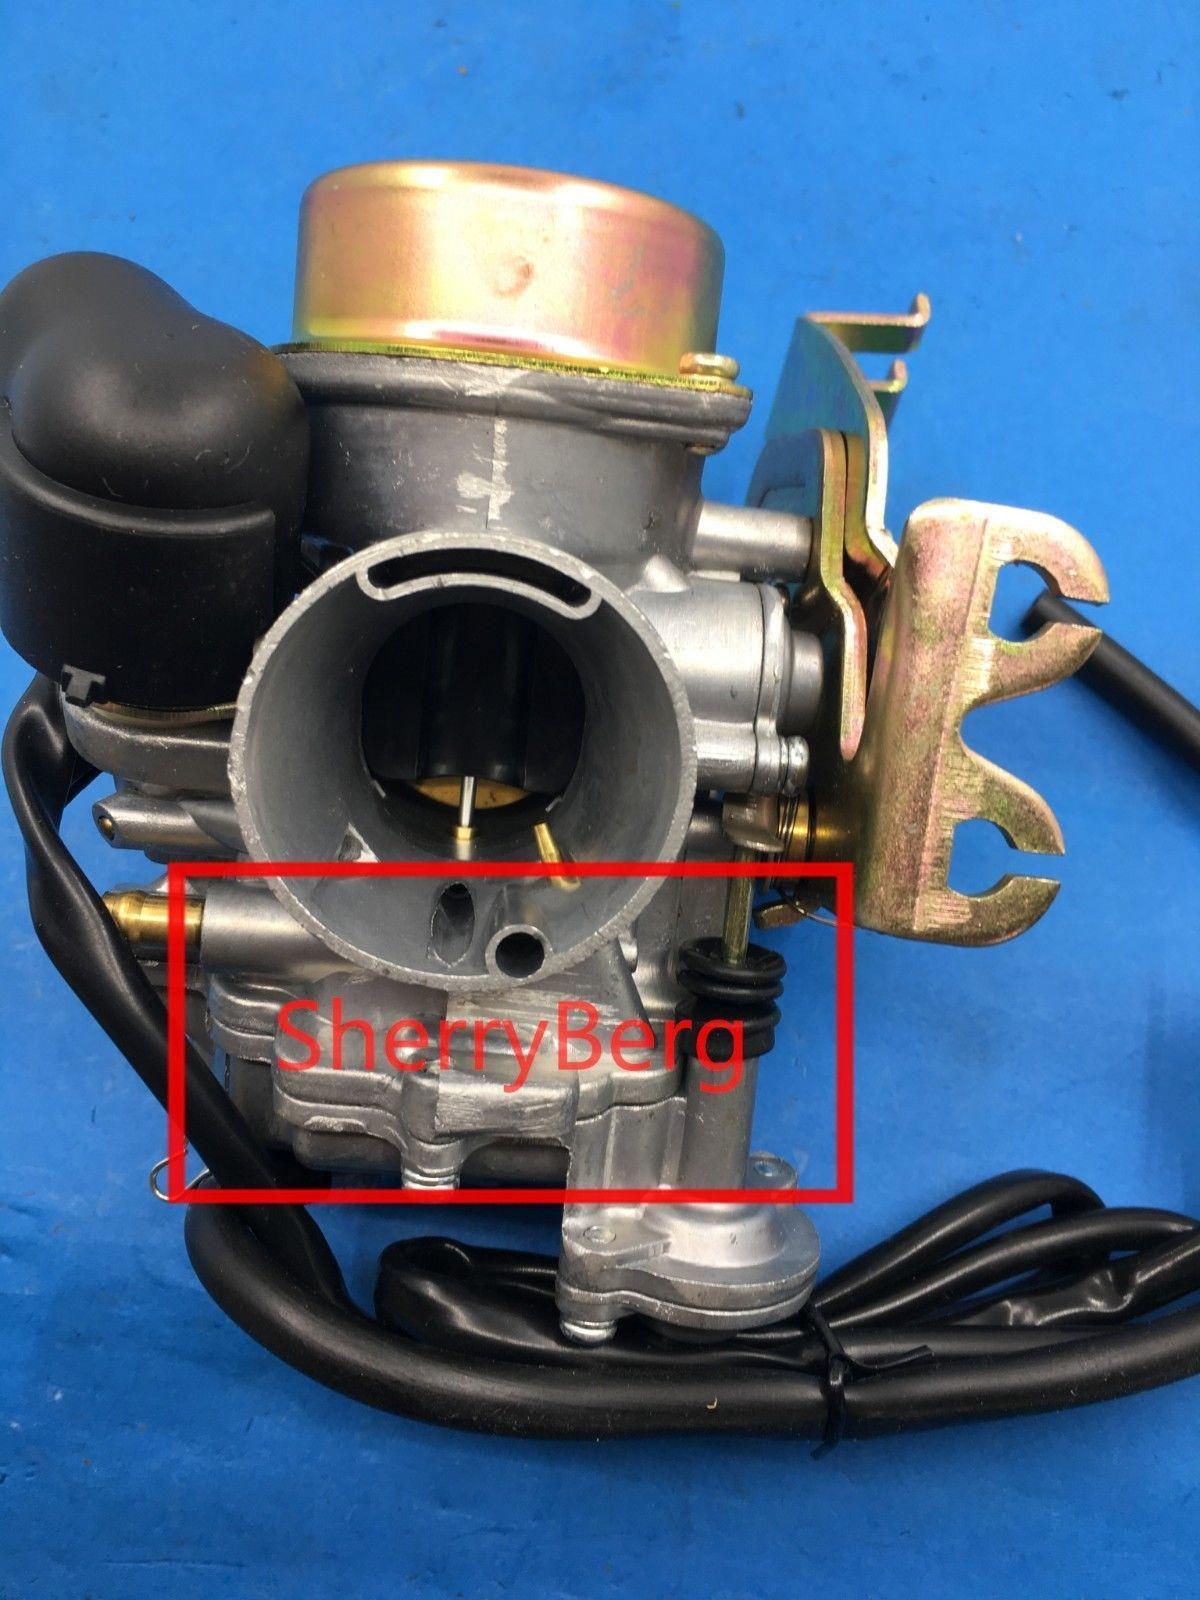 150cc 125cc GY6 atv YAMAHA Honda için yeni 32mm Performans CVK32 Karbüratör karbonhidrat